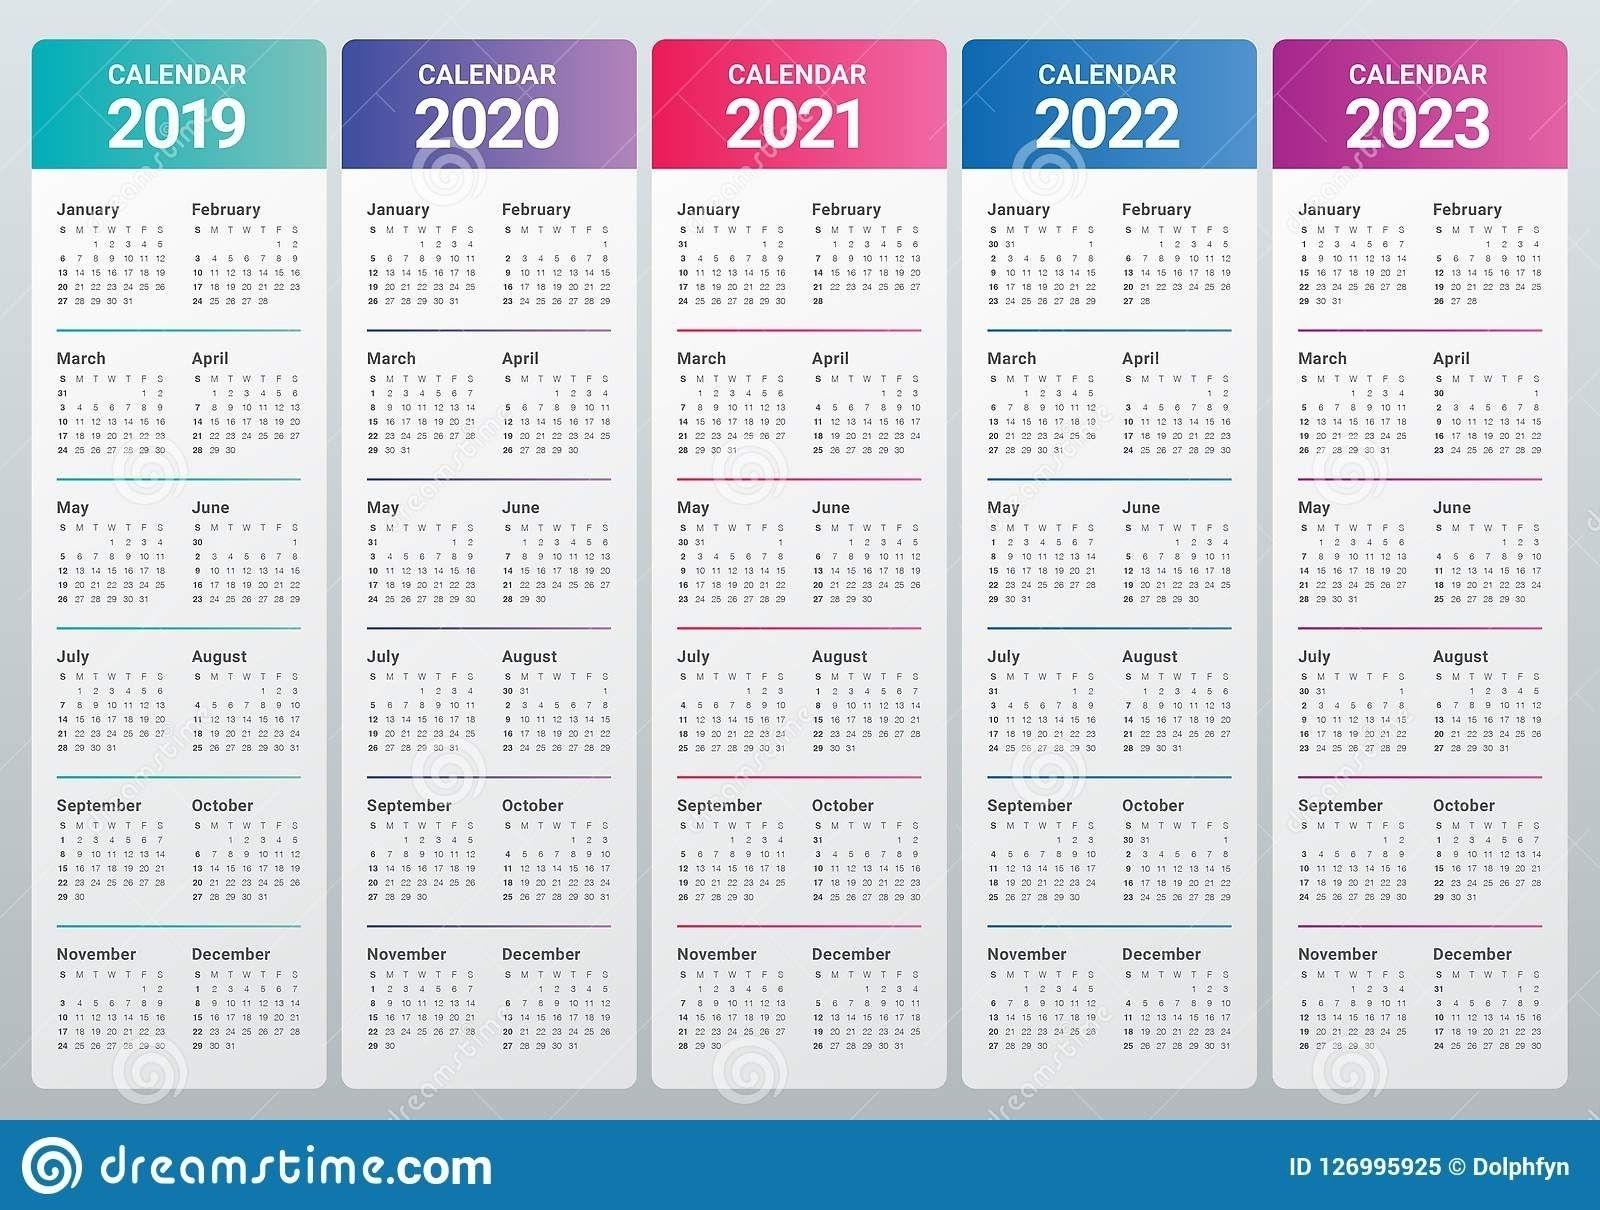 Printable Calendar 2020 2021 2022 2023 Calendar